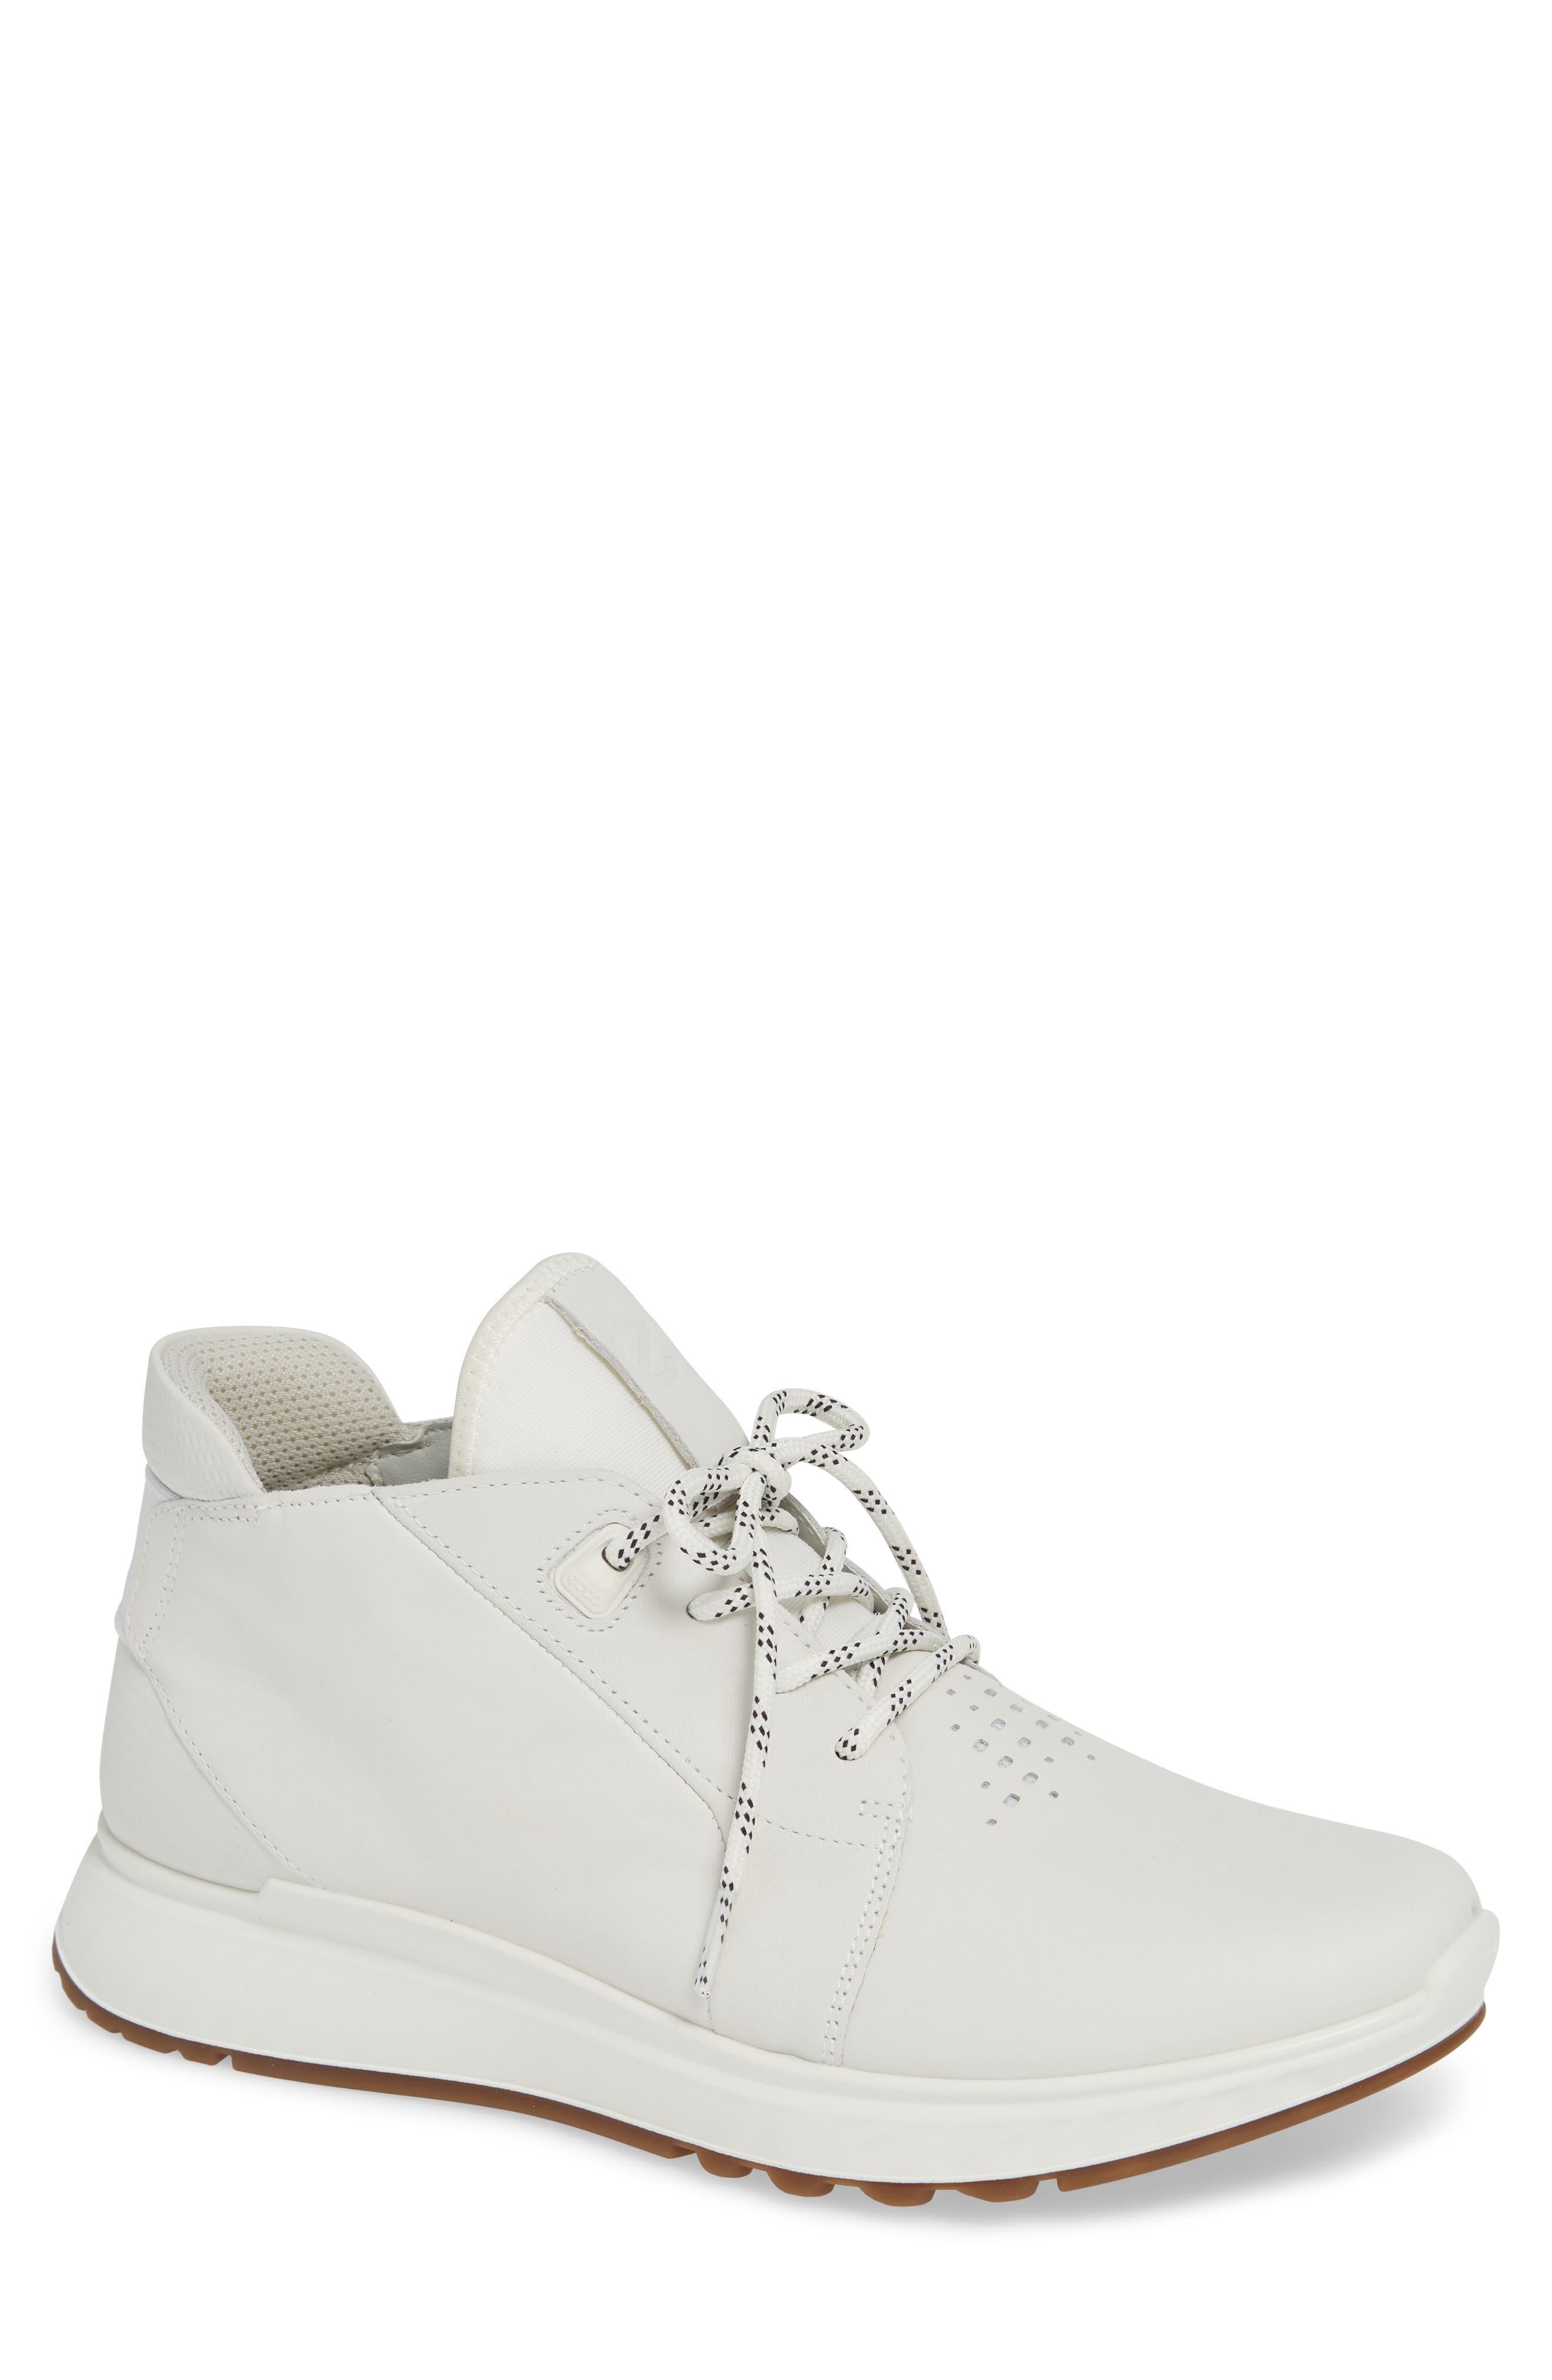 Ecco St1 High Top Zipper Sneaker,9.5 - White